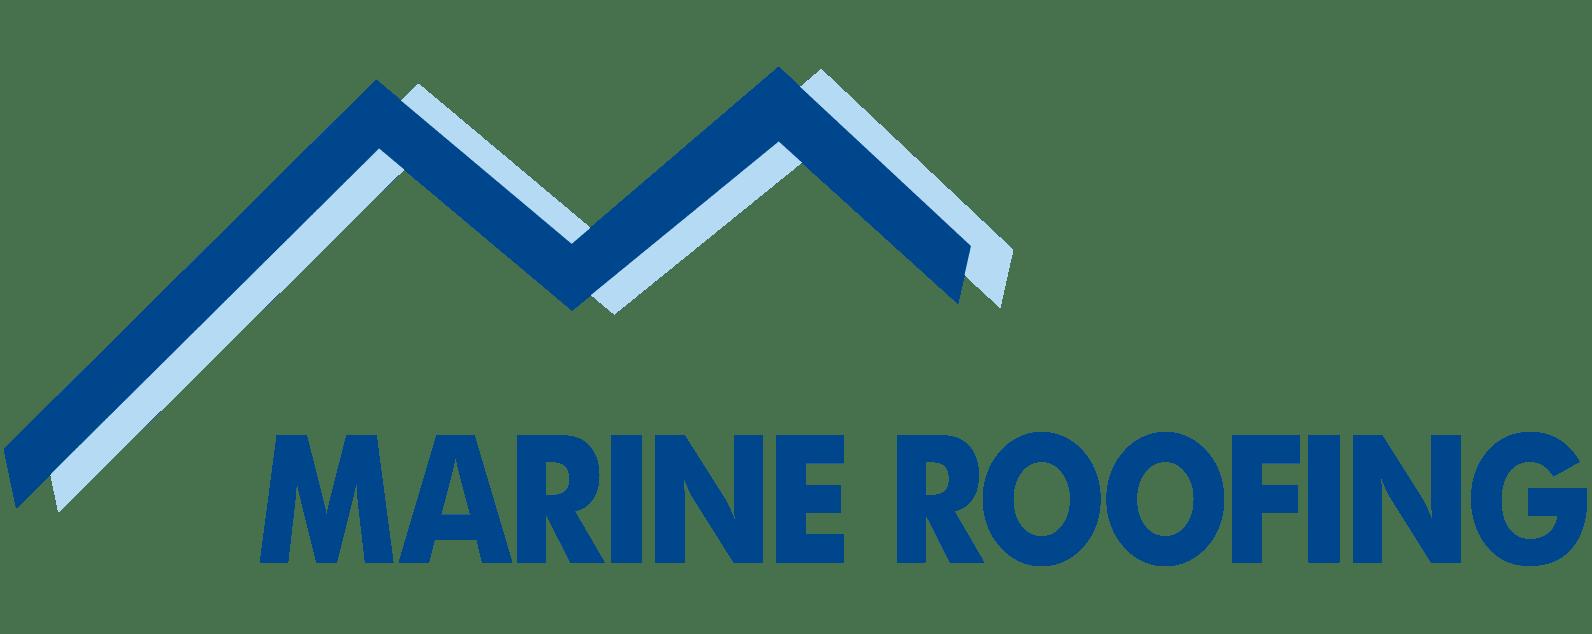 Marine Roofing [1592x634]